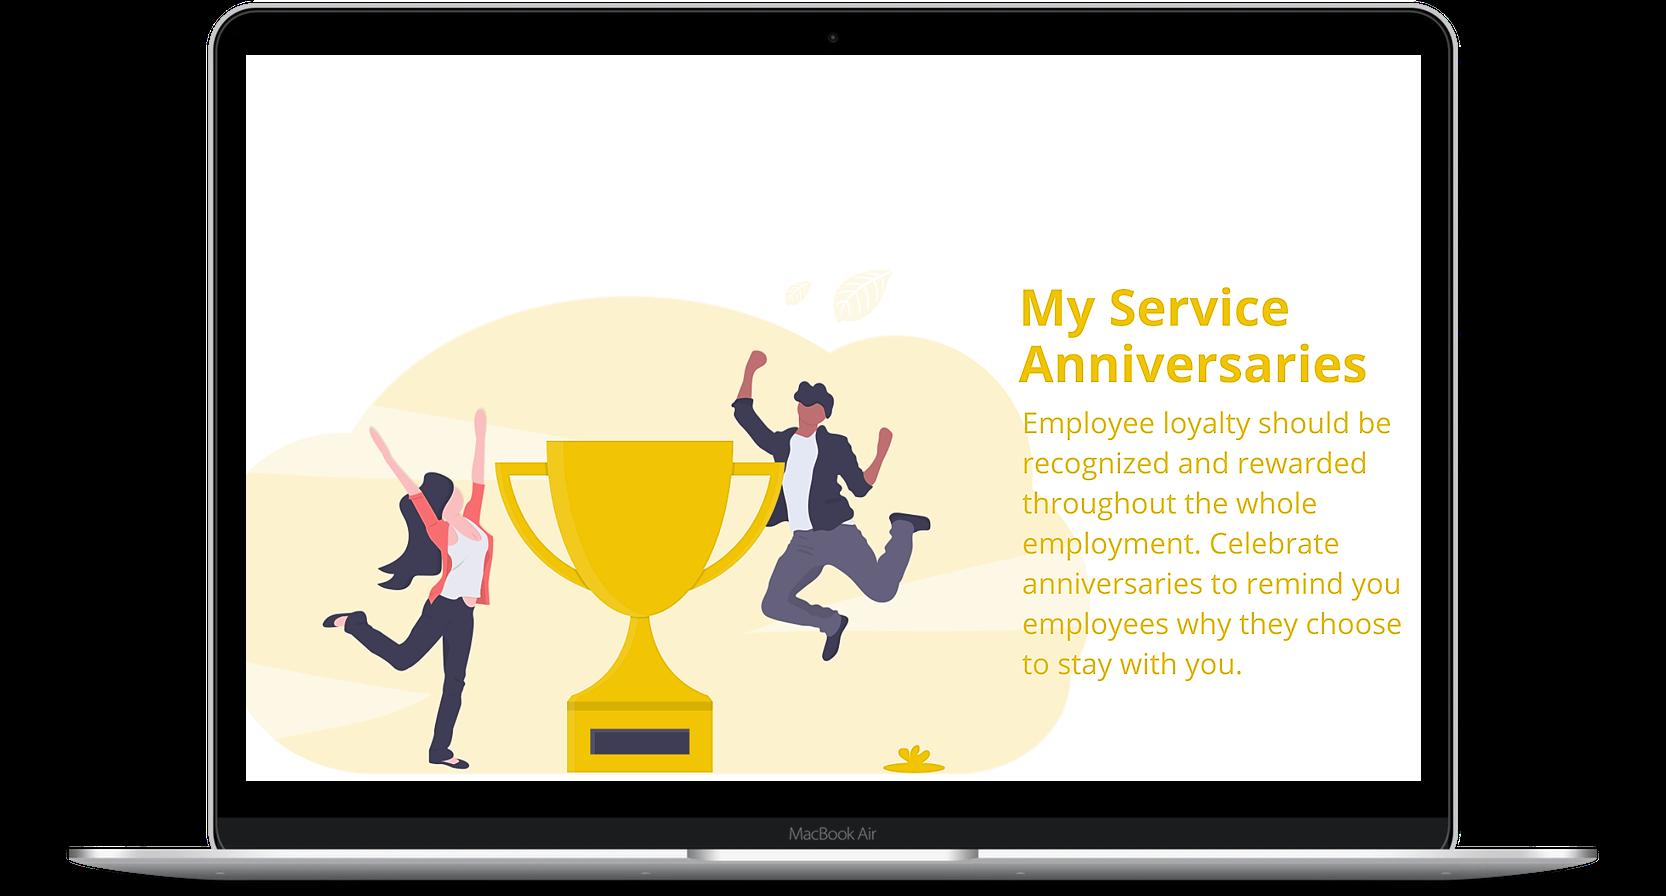 employee-service-anniversaries